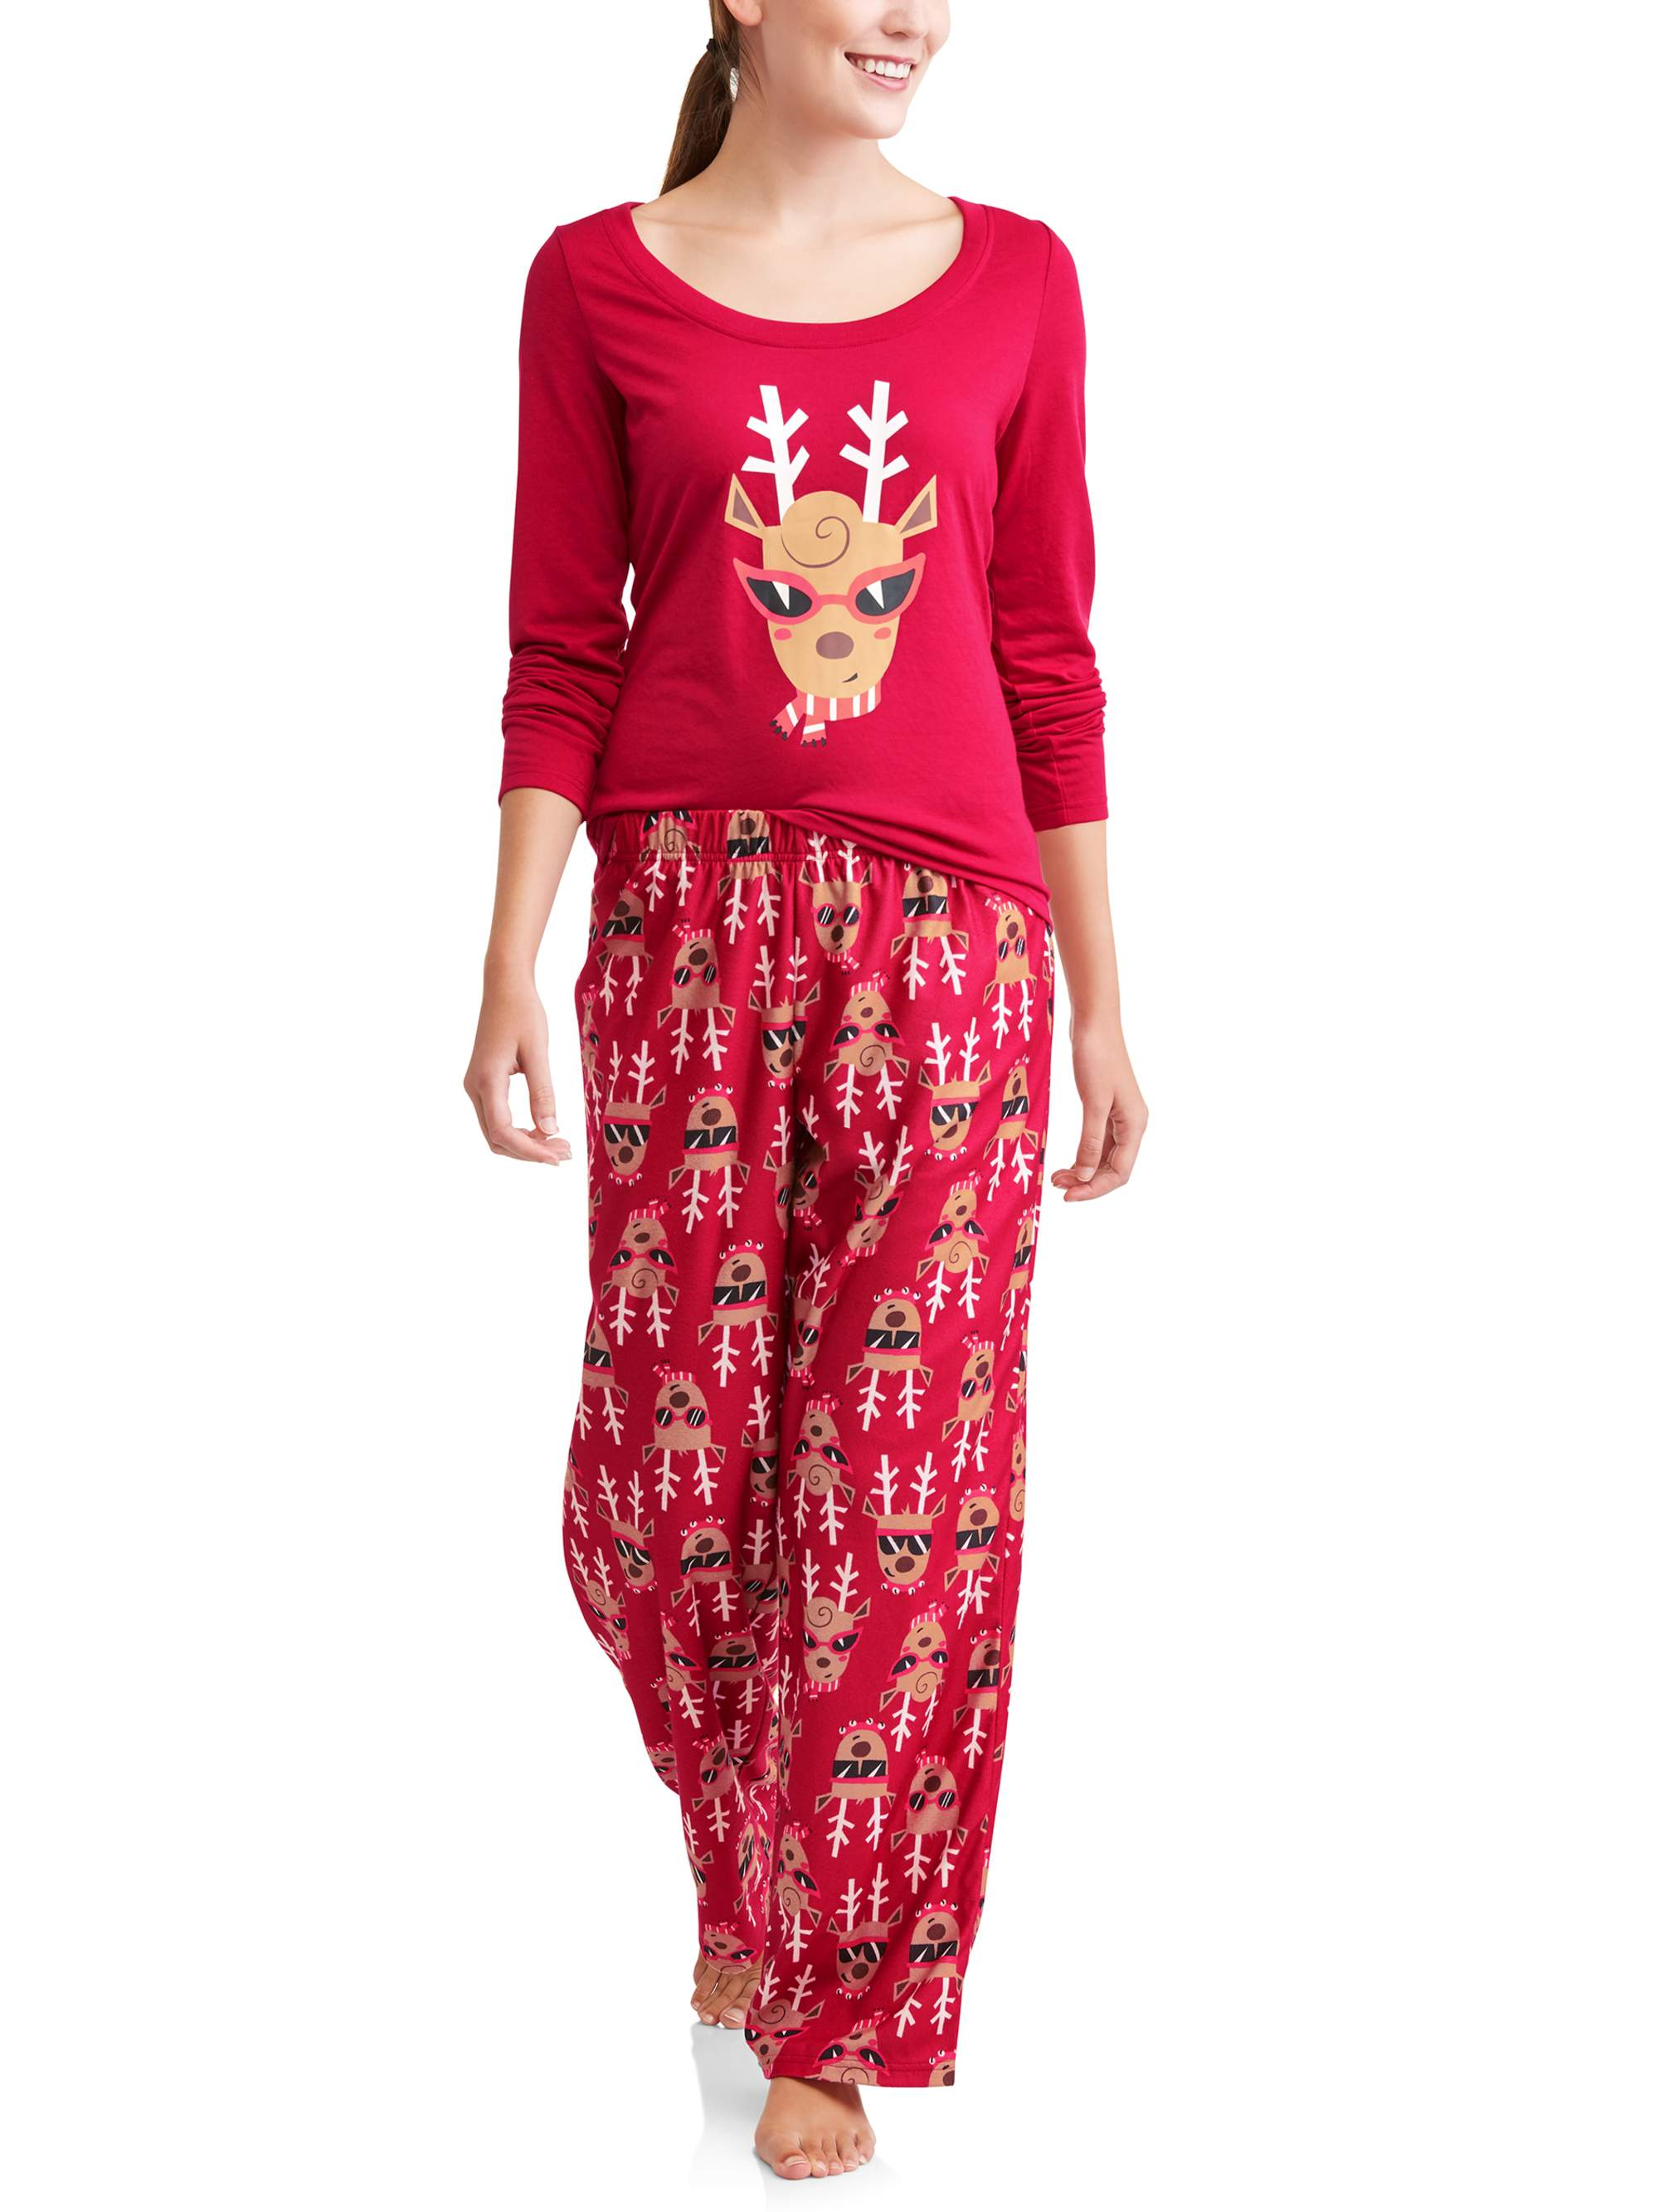 Toast & Jammies Holiday Family Sleep Reindeer 2-Piece Pajama Set (Women's)